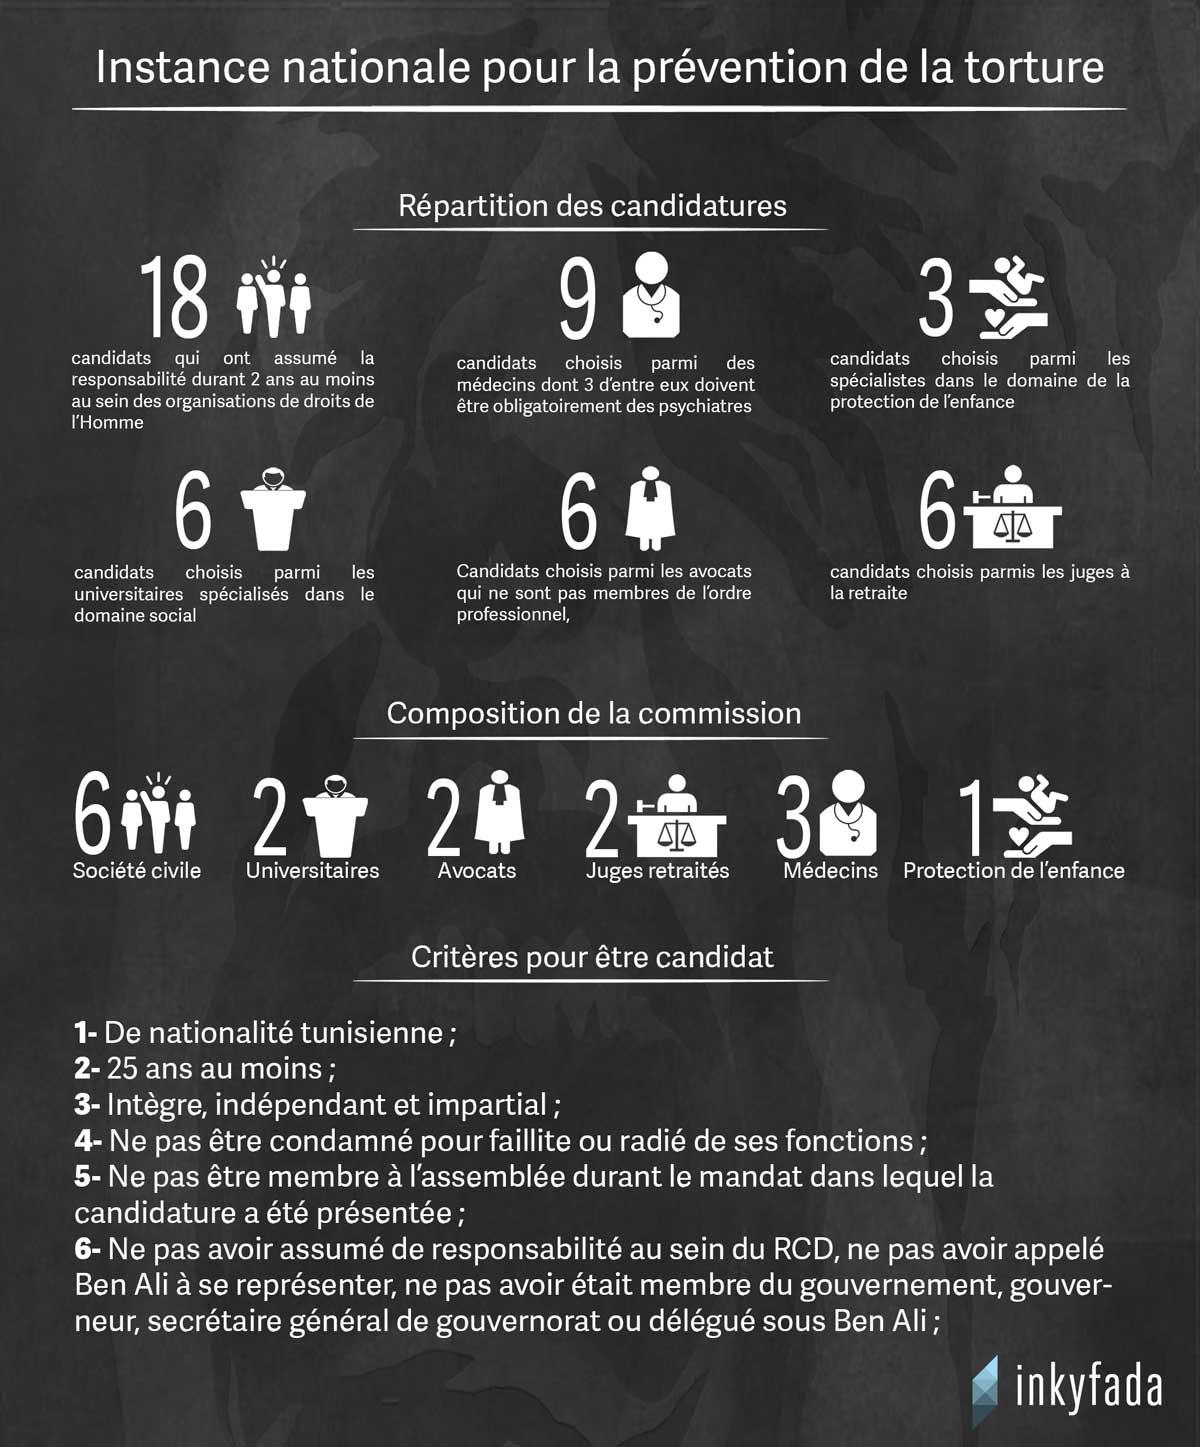 torture-info1-inkyfada